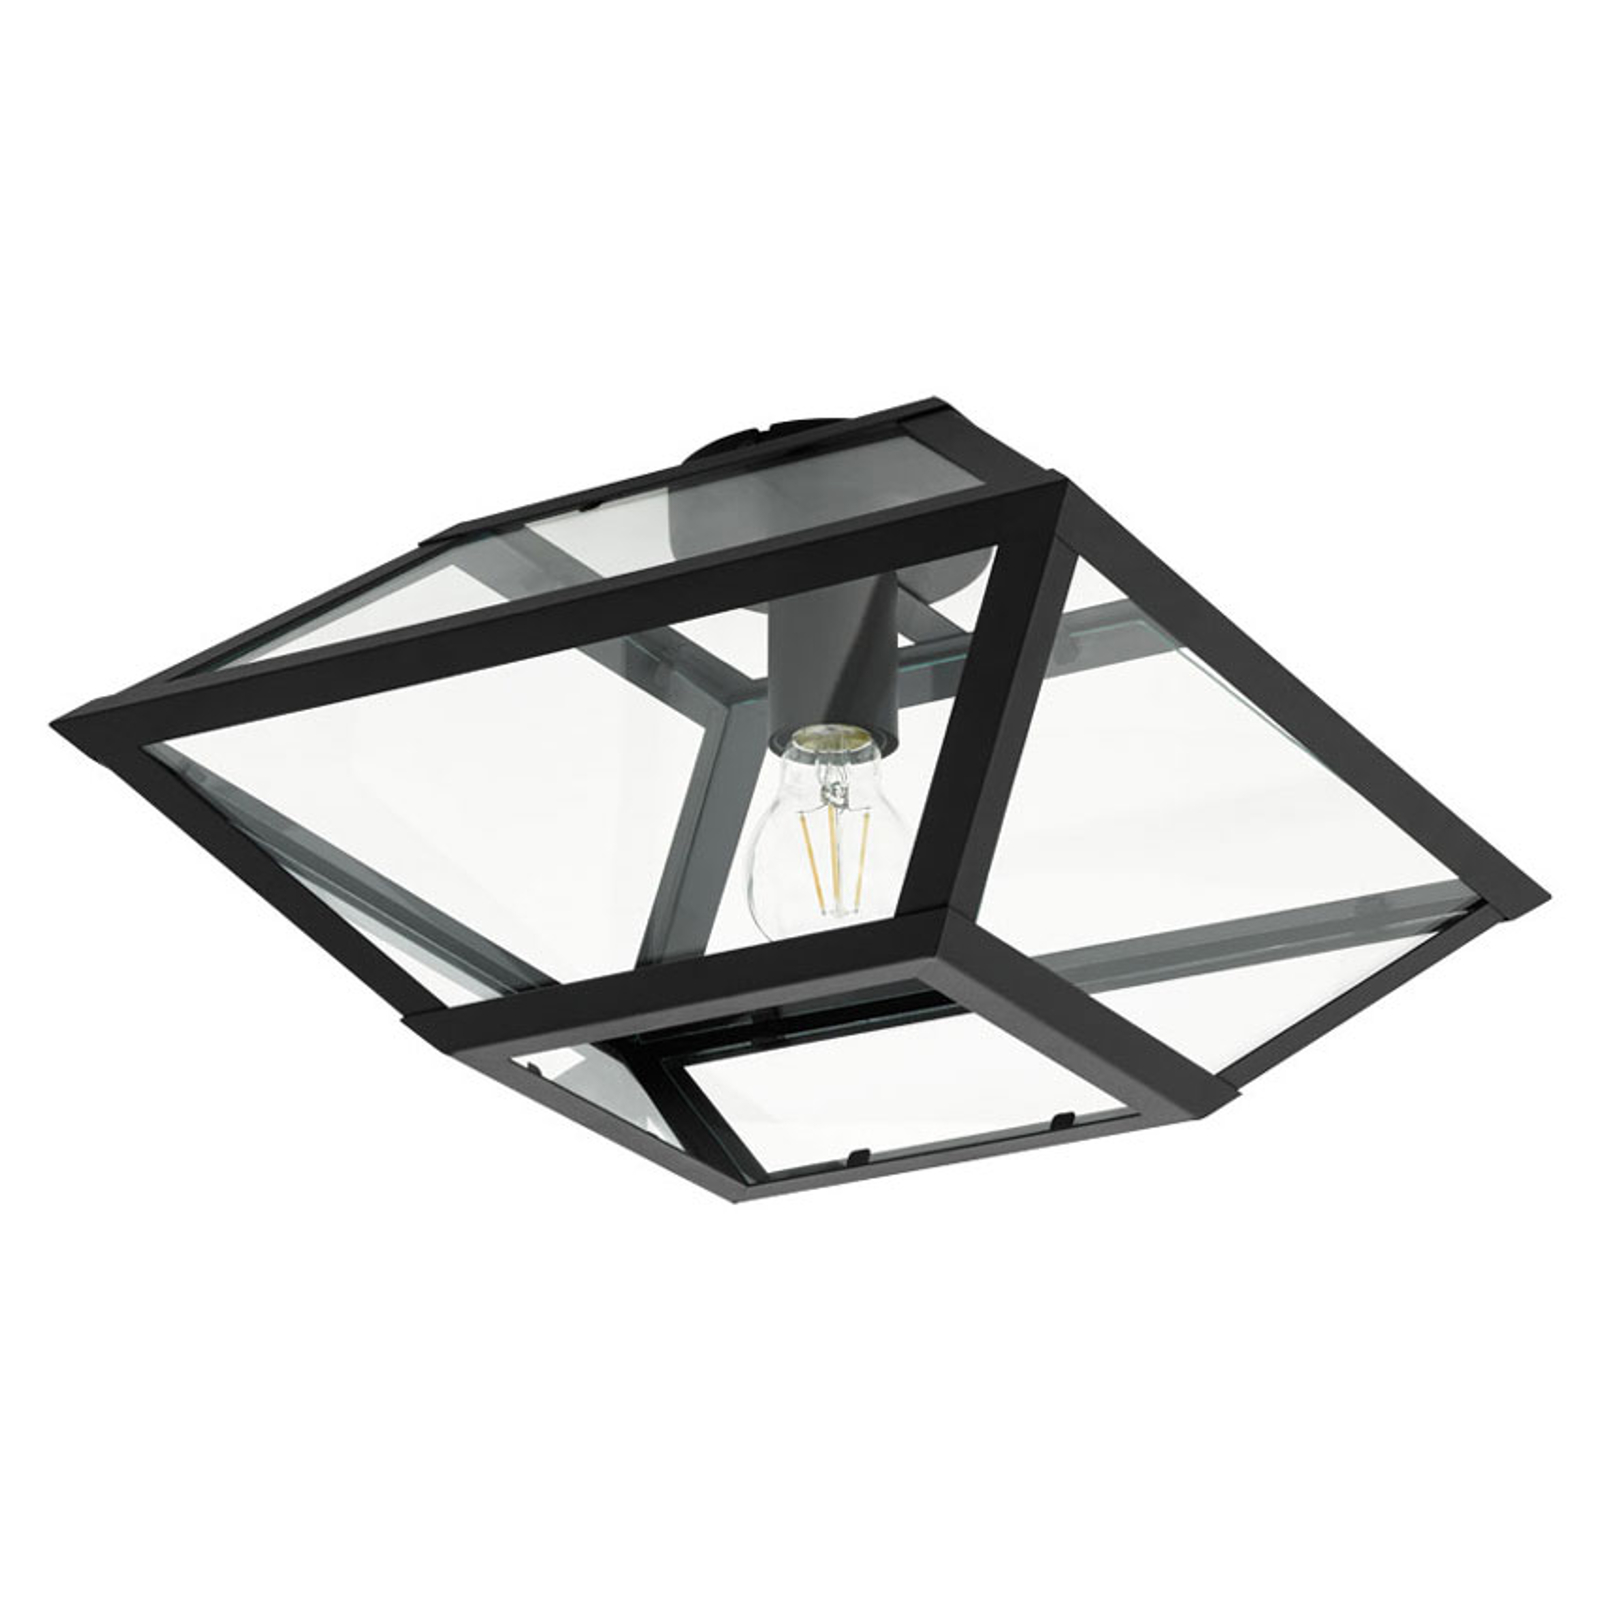 Lampa sufitowa Casefabre ze stali, 37x37 cm